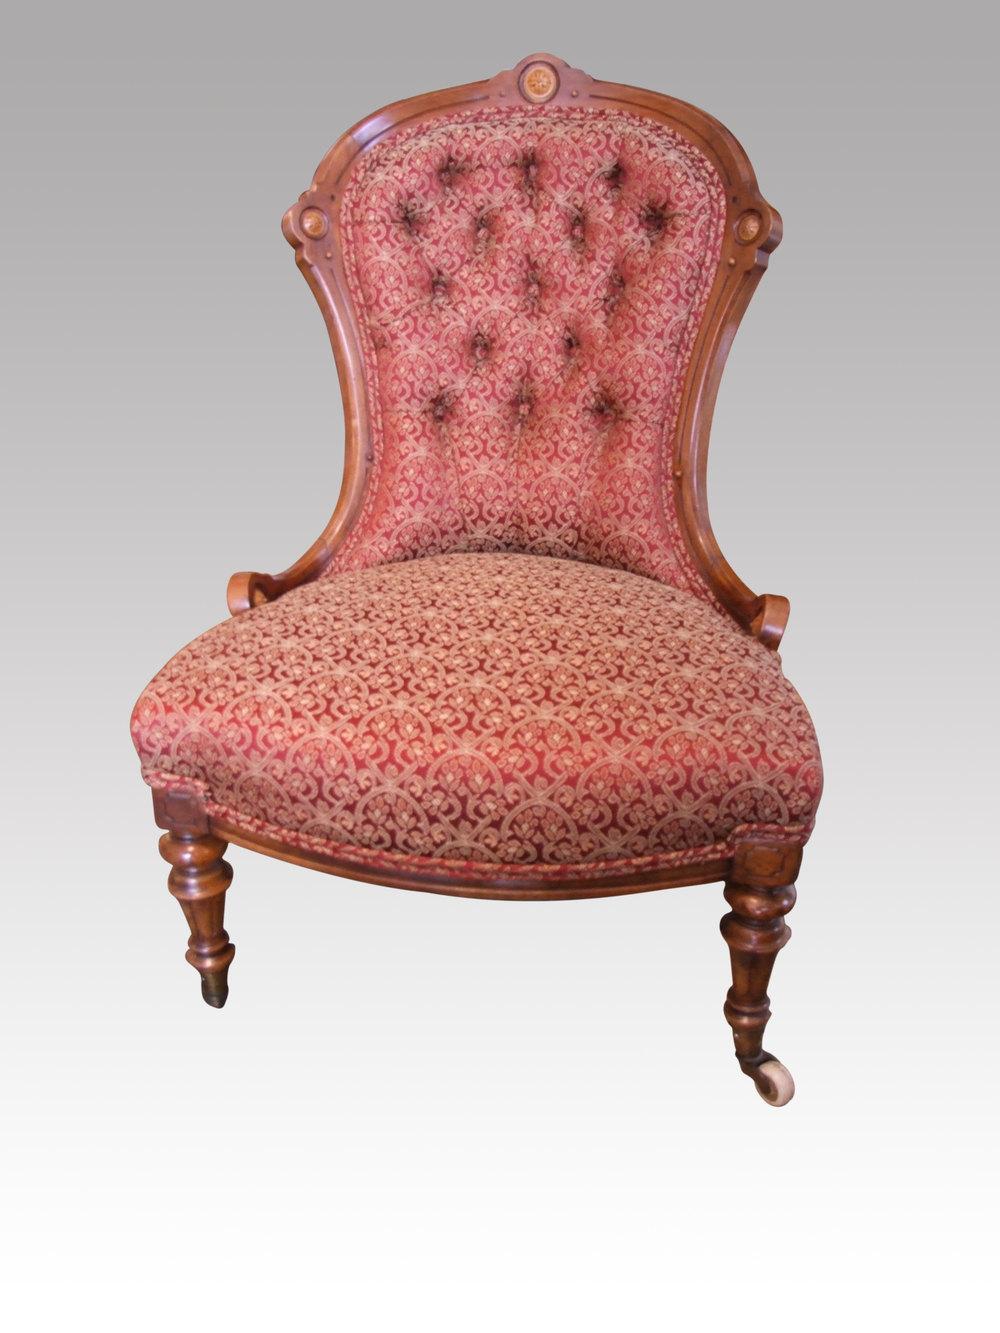 Aestetic Walnut Nursing Chair - Antiques Atlas